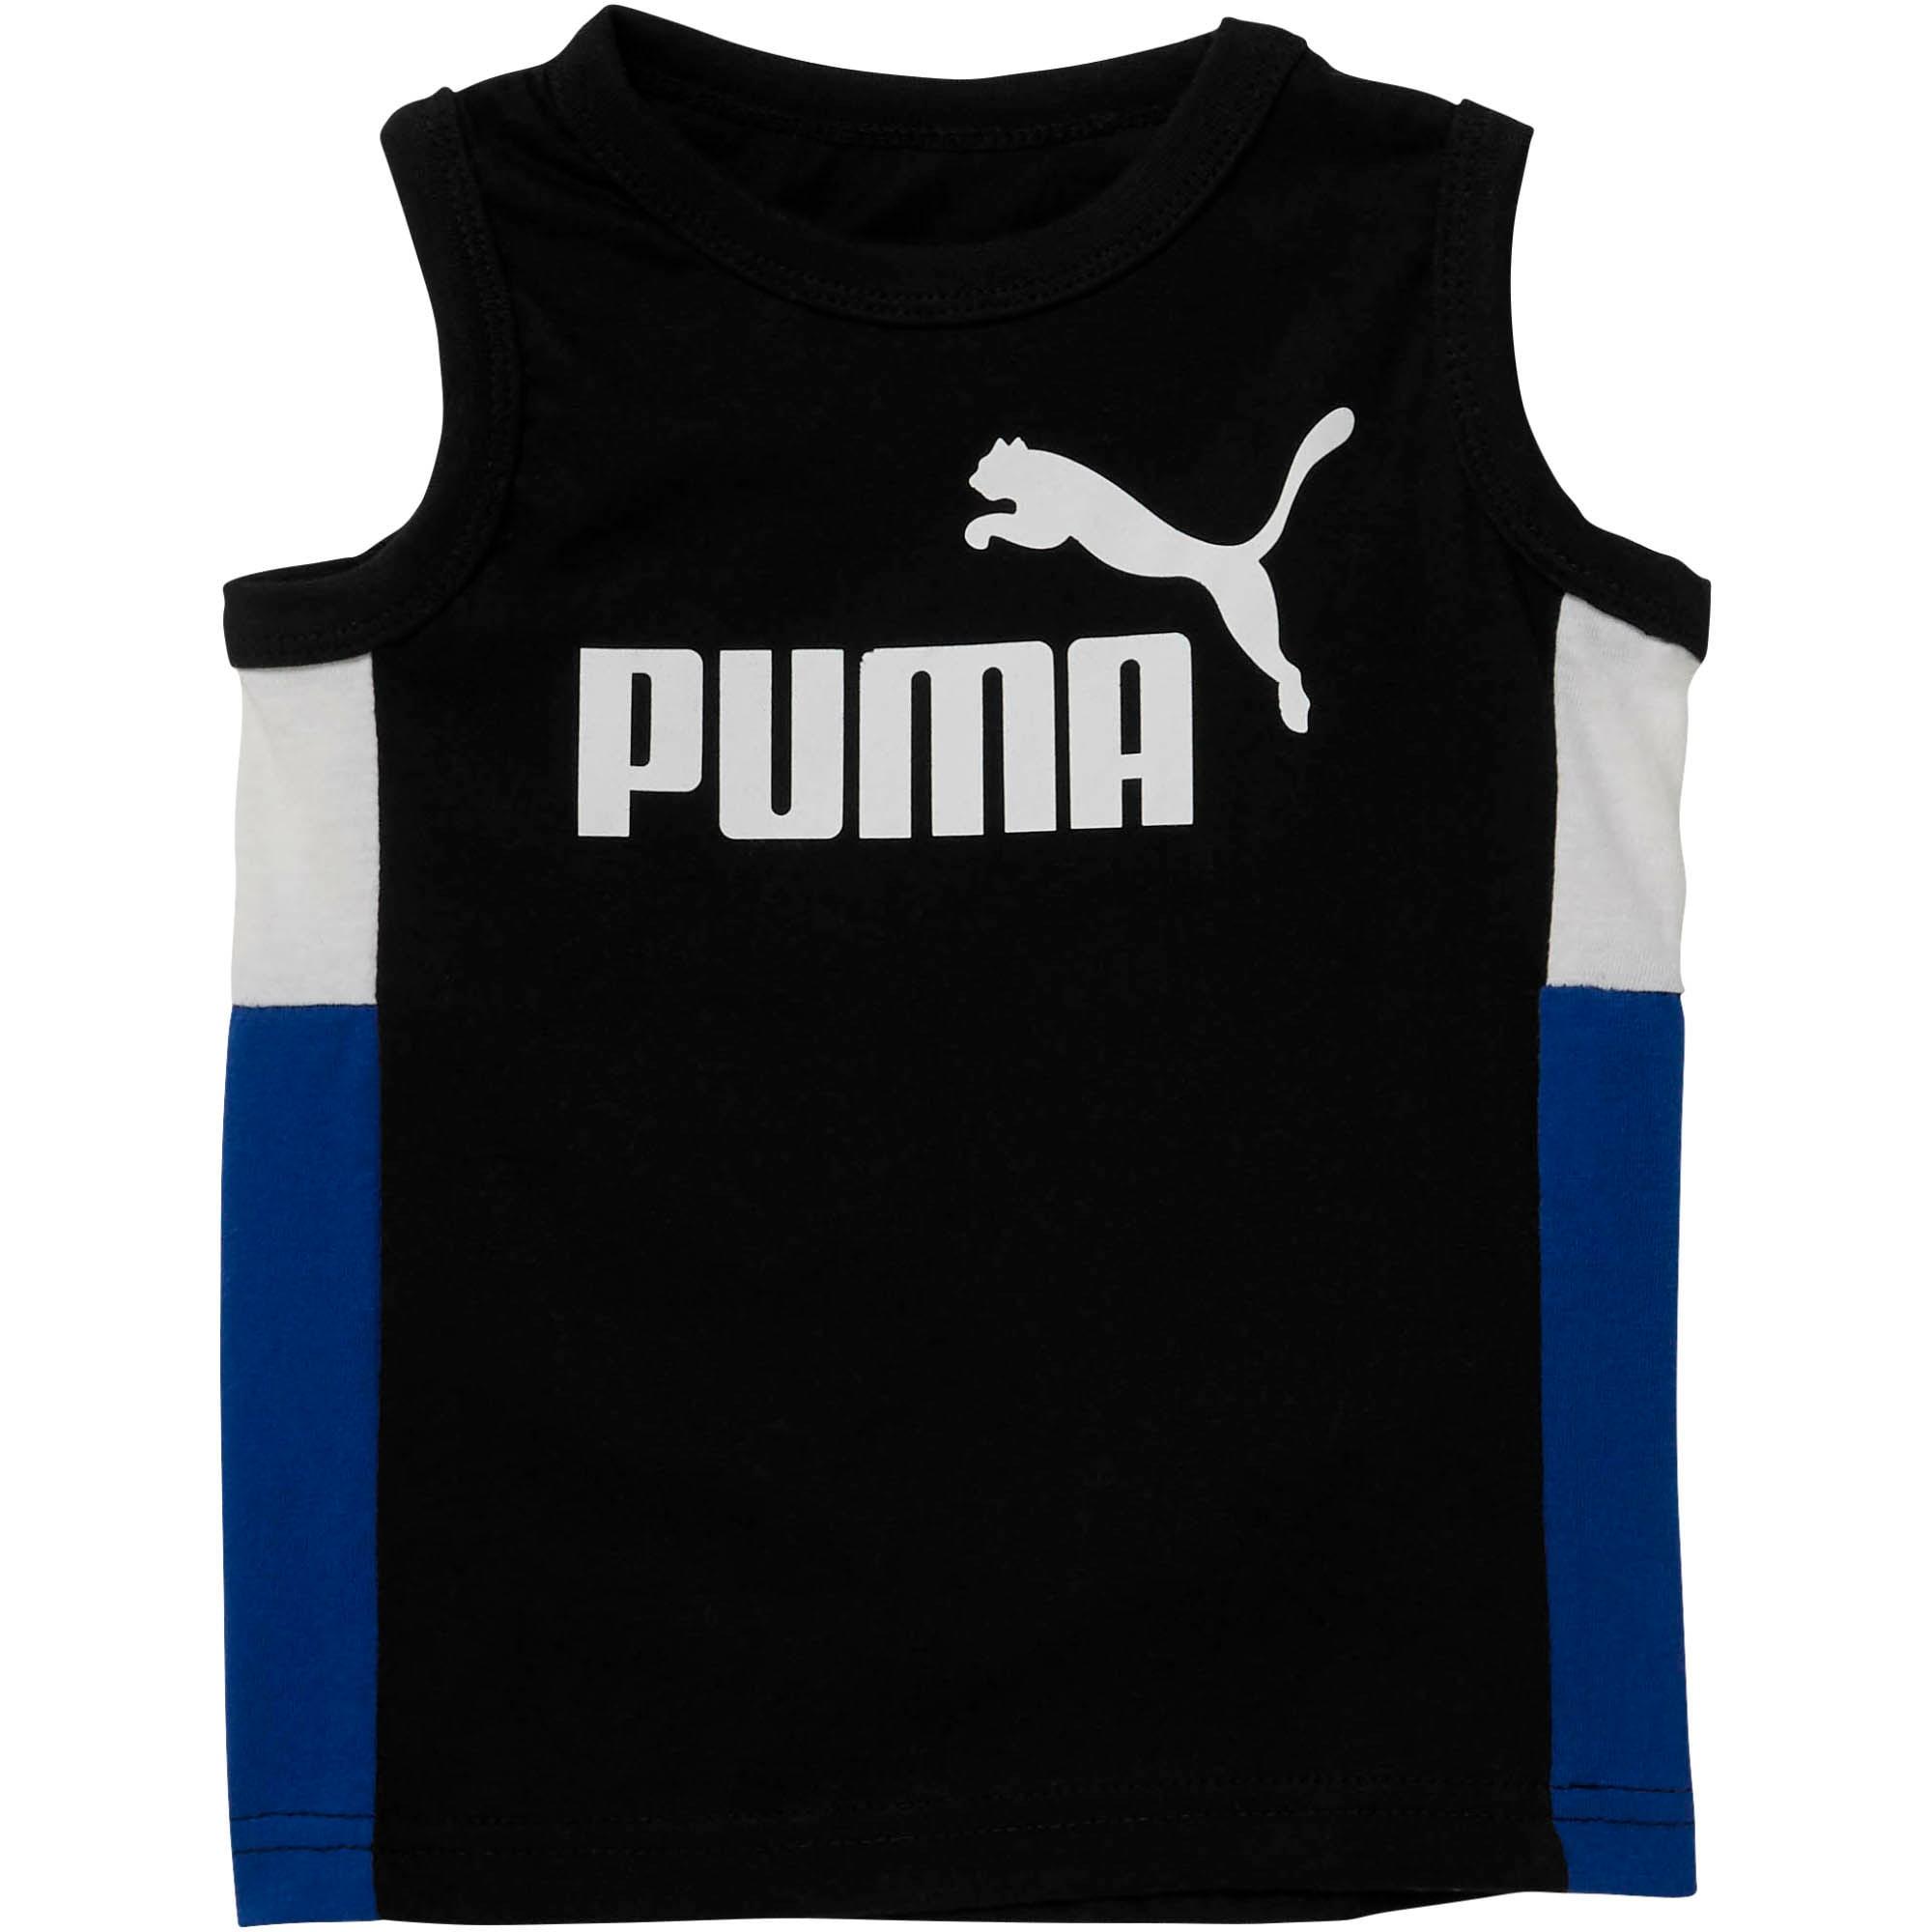 Thumbnail 1 of Toddler Colorblock Muscle Tank, PUMA BLACK, medium